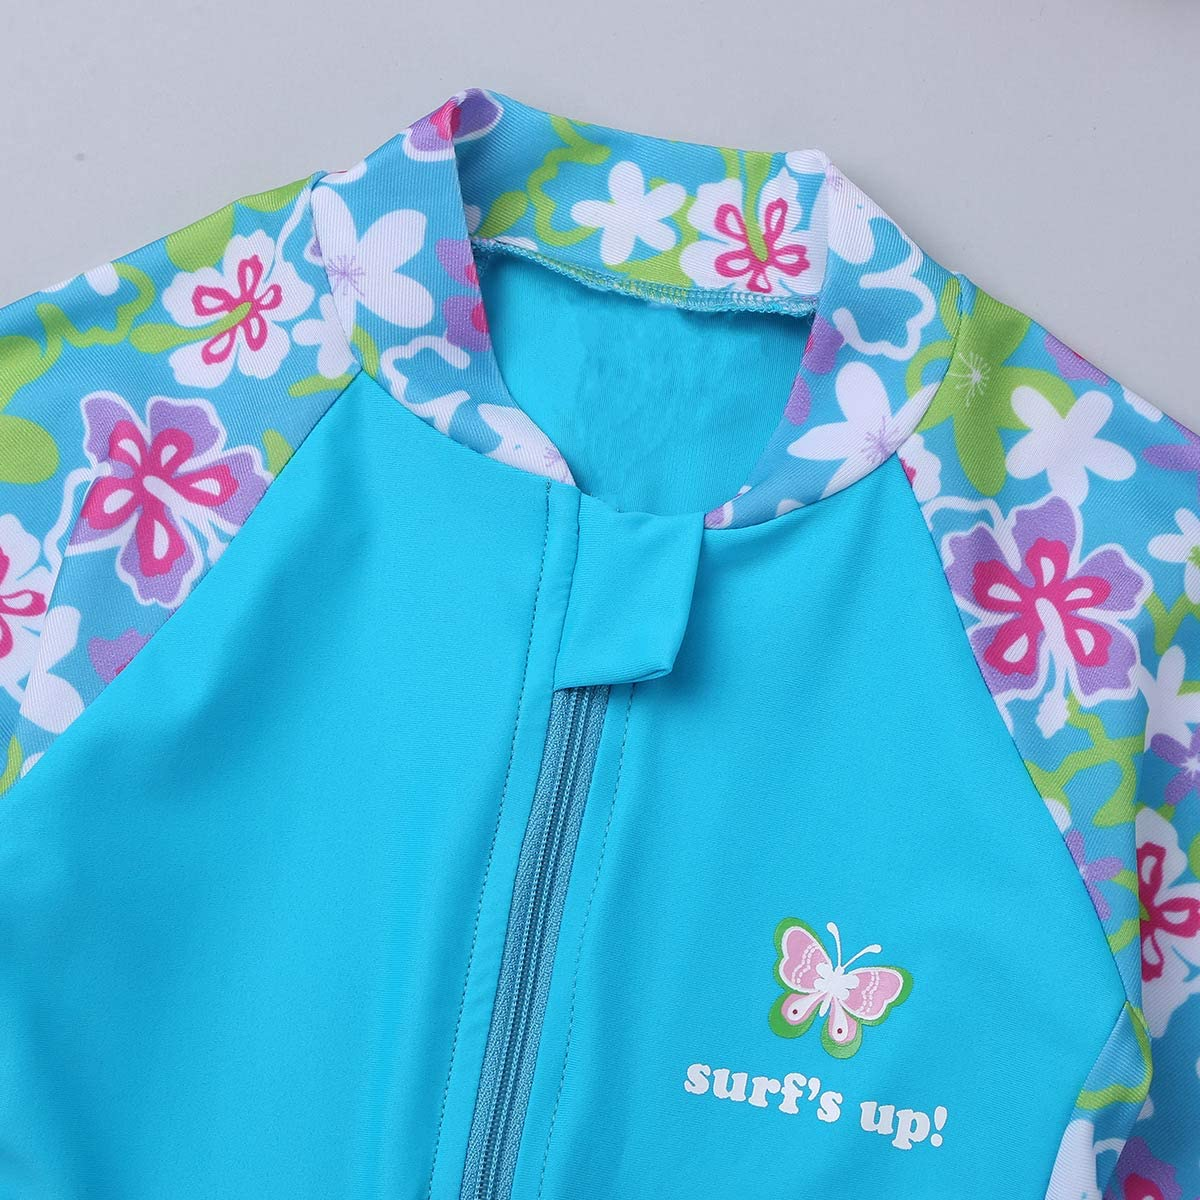 zdhoor Kids Girls One-Piece Long Sleeves Wetsuit Swimsuit Flower Printed Keep Warm Rash Guard Swimwear UPF 50+